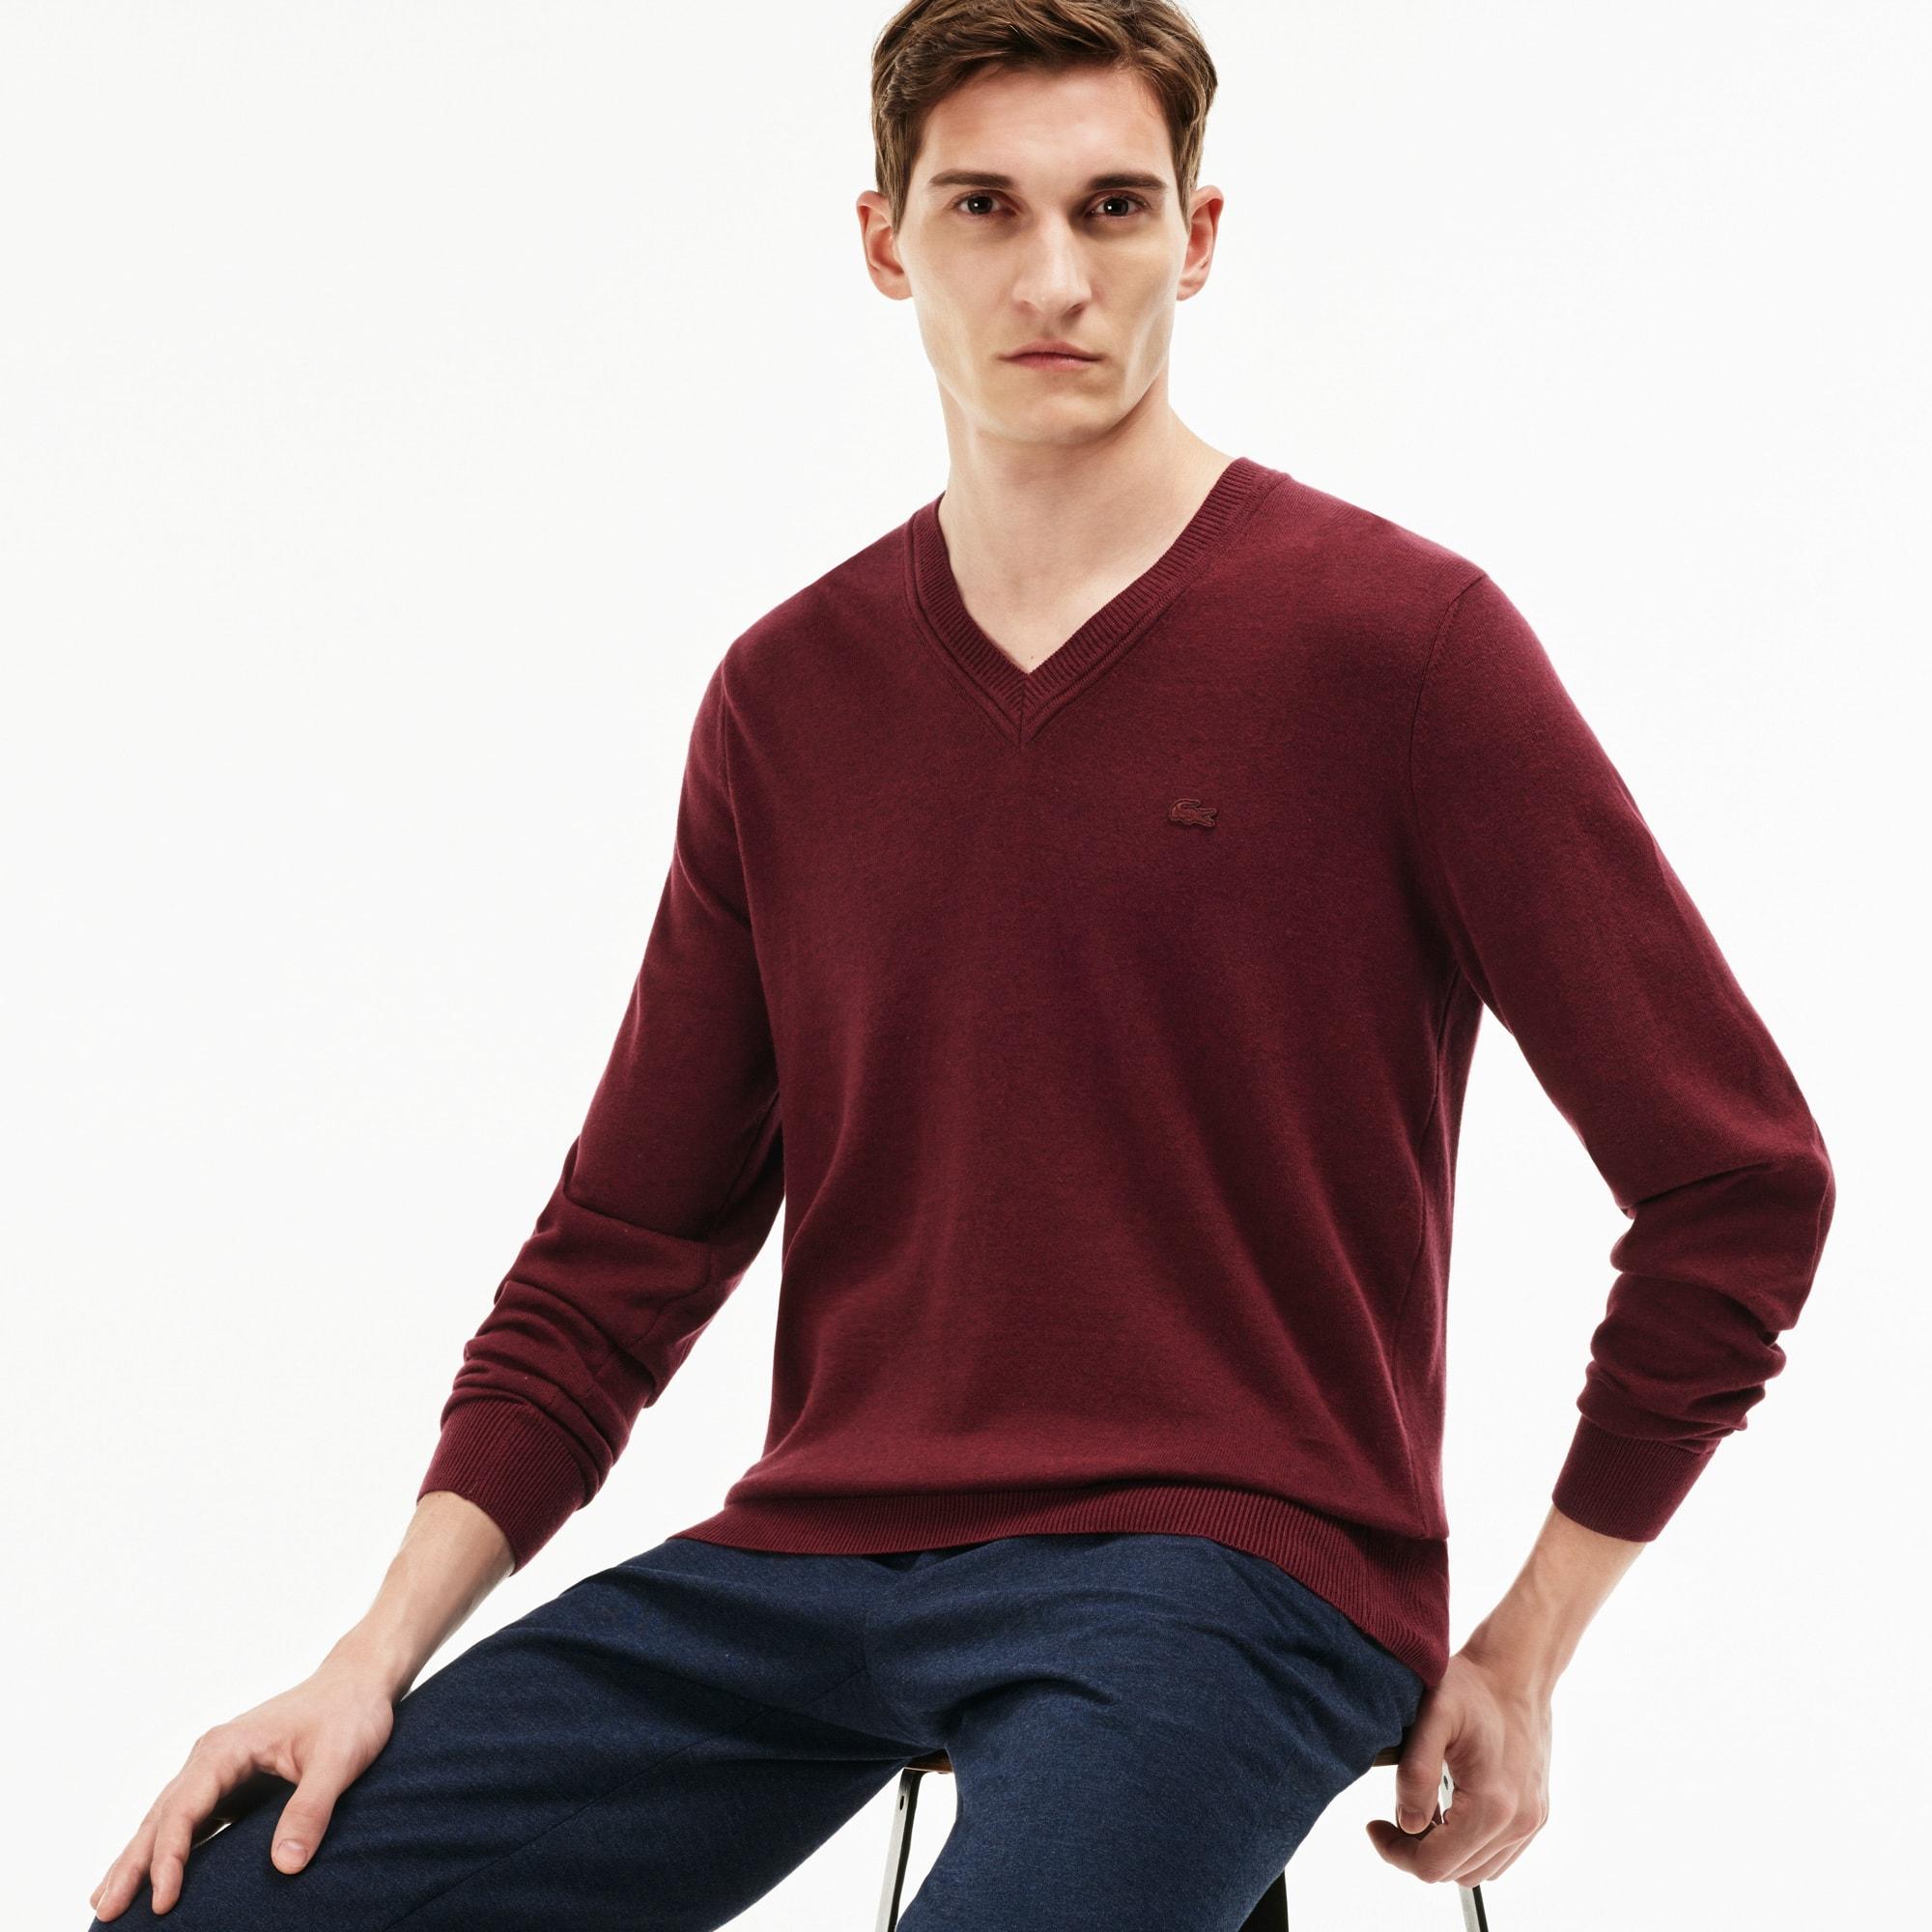 Men's Ribbed V-Neck Sweater